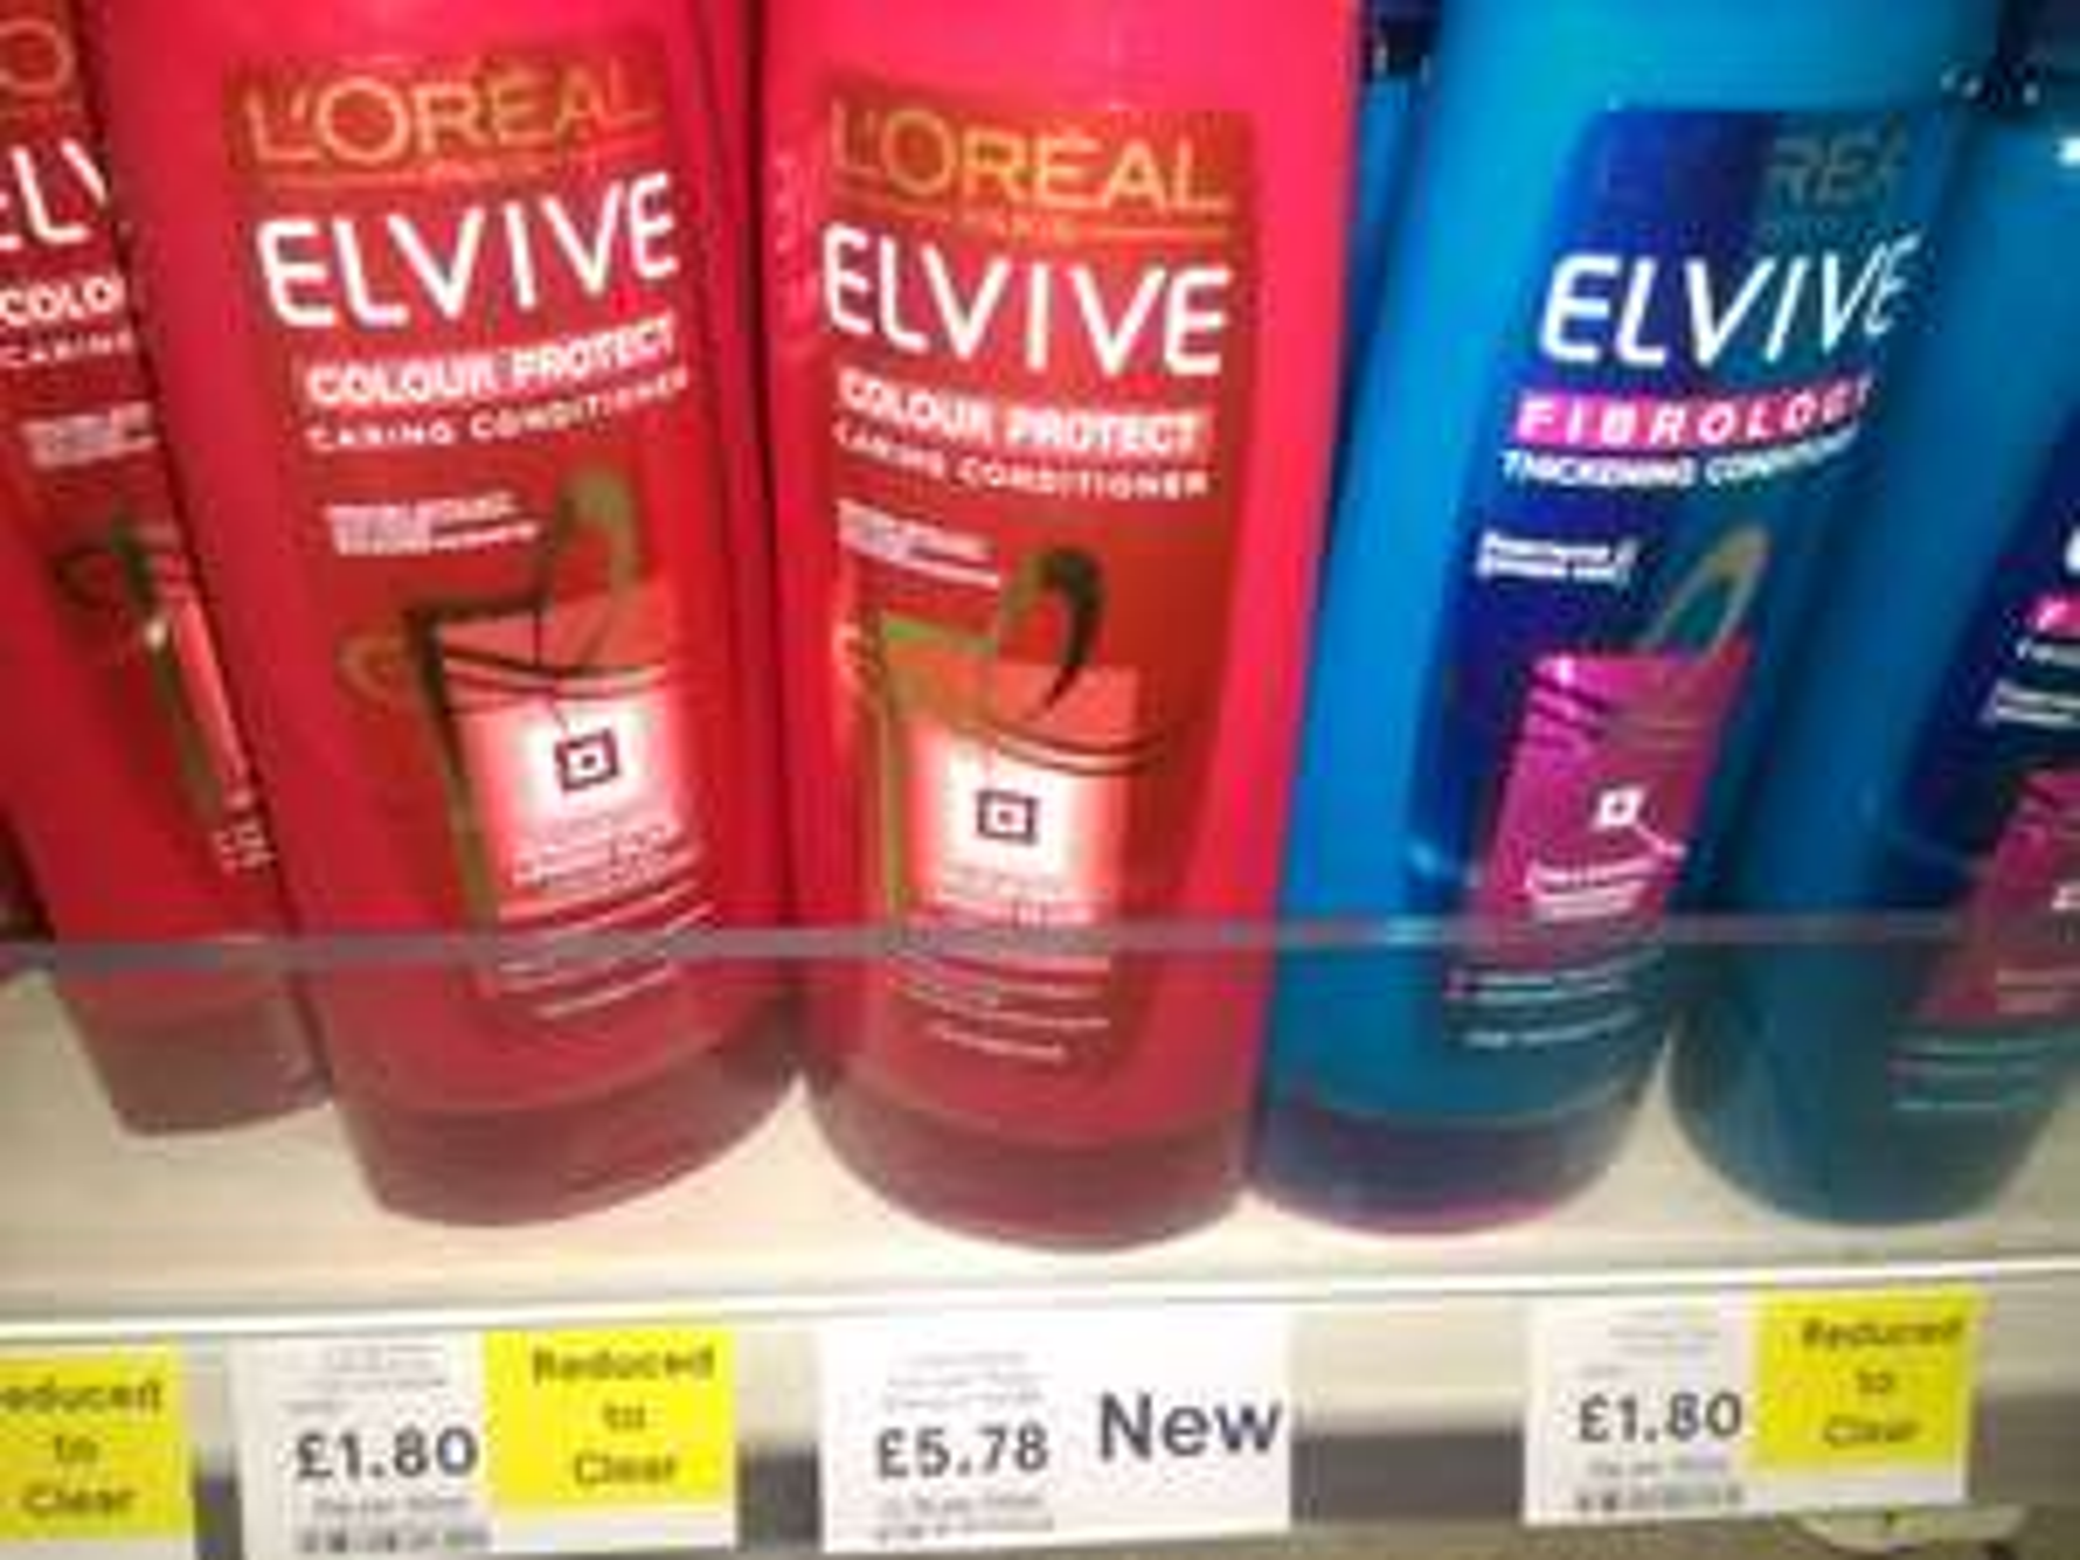 Tesco (Express) Loreal Elvive Shampoo+Conditioner 400ml £1.80 - instore